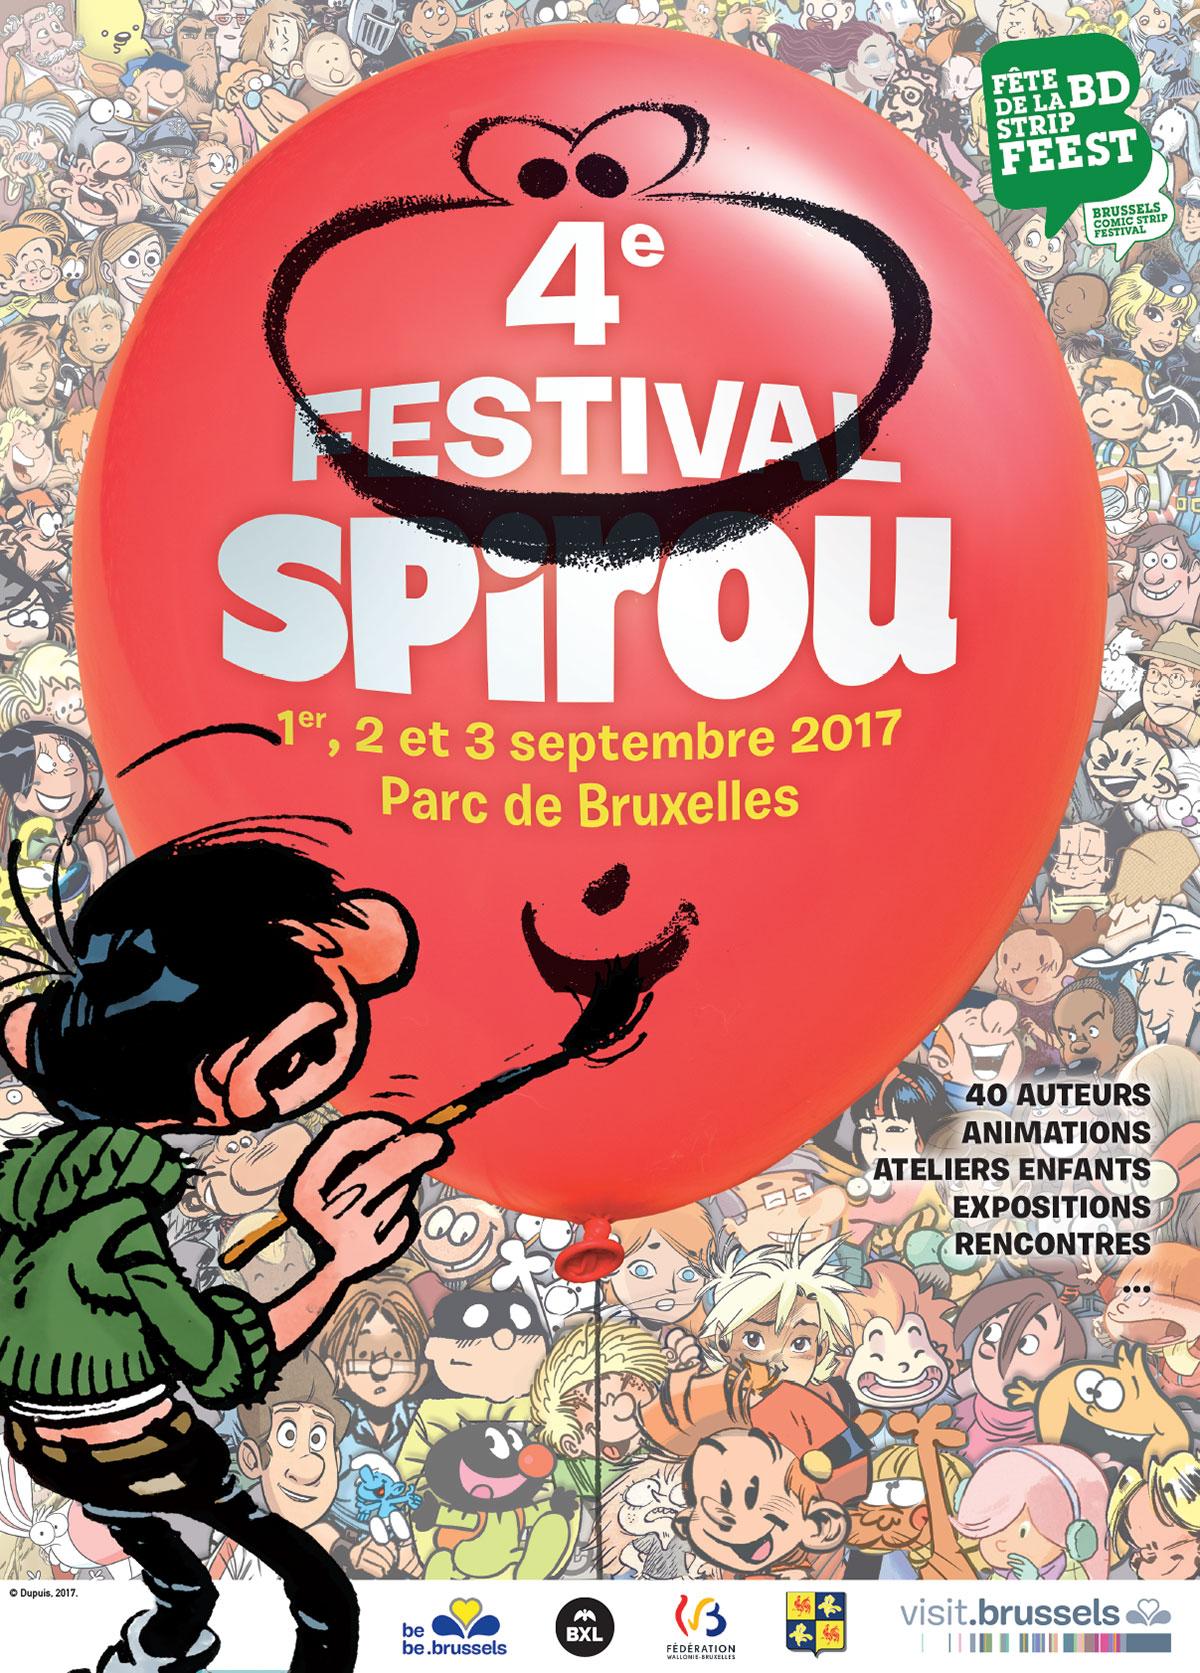 Affiche du 4e Festival Spirou